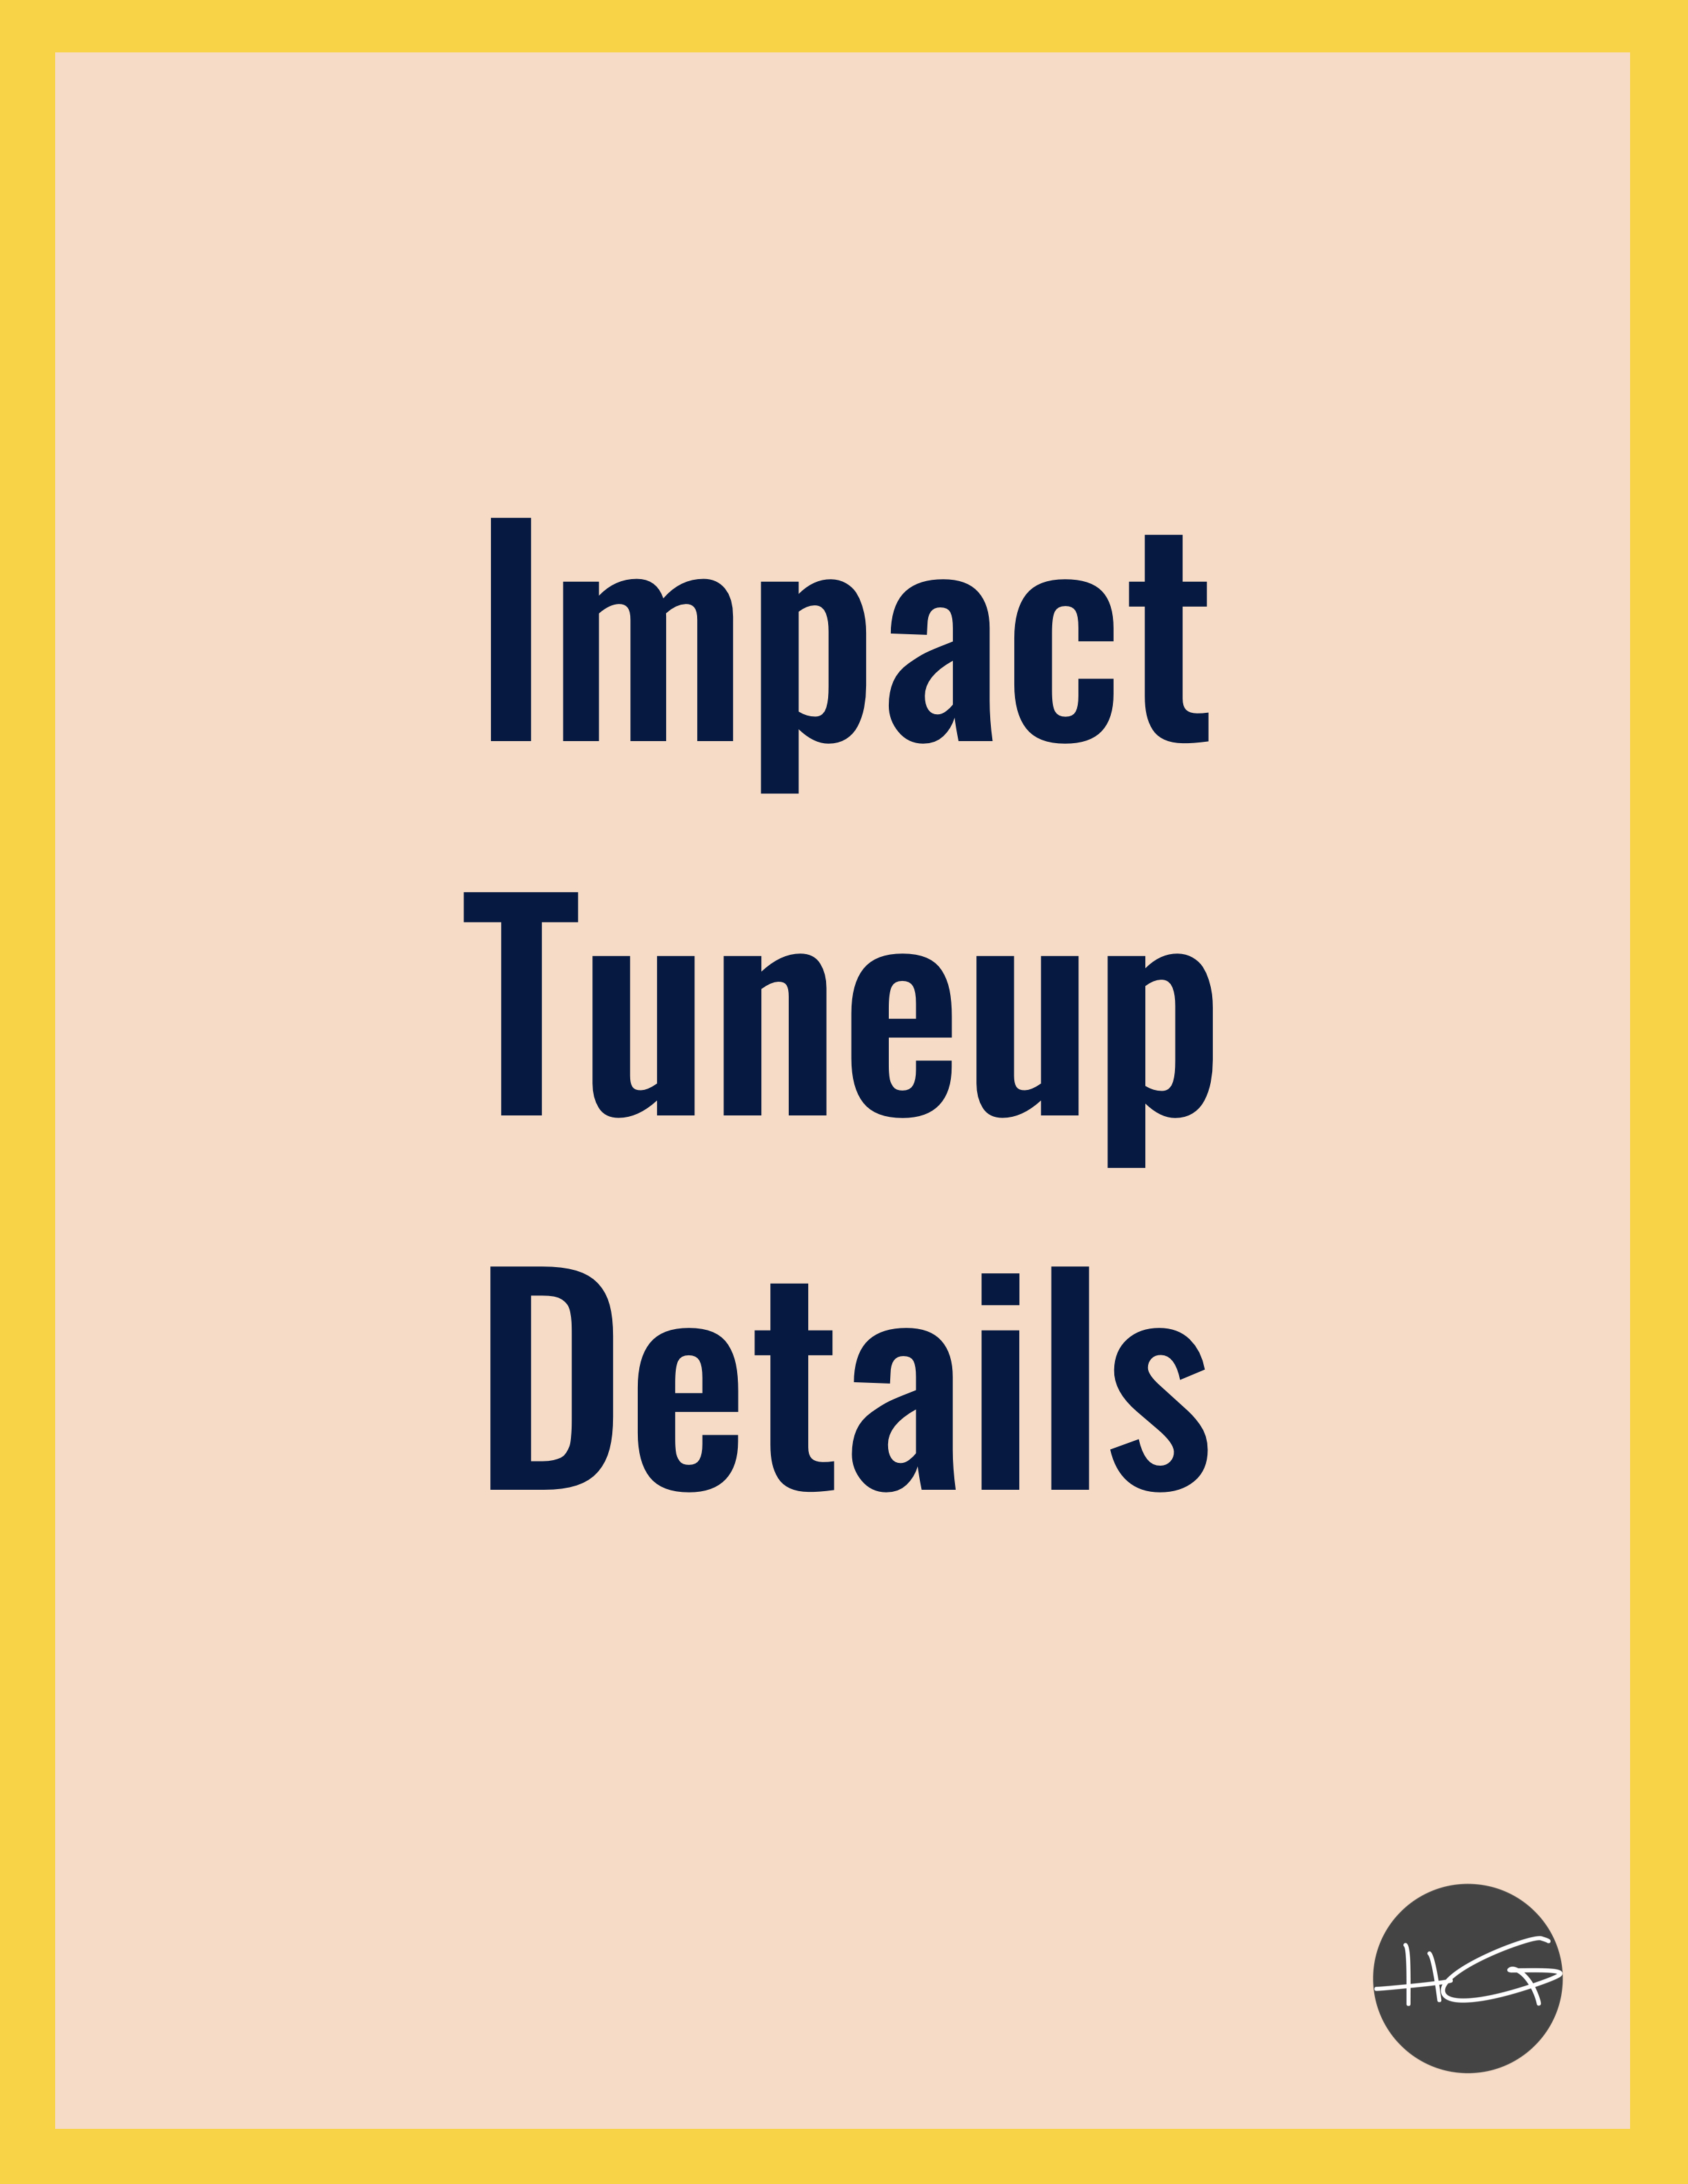 Impact Tuneup Details .jpeg